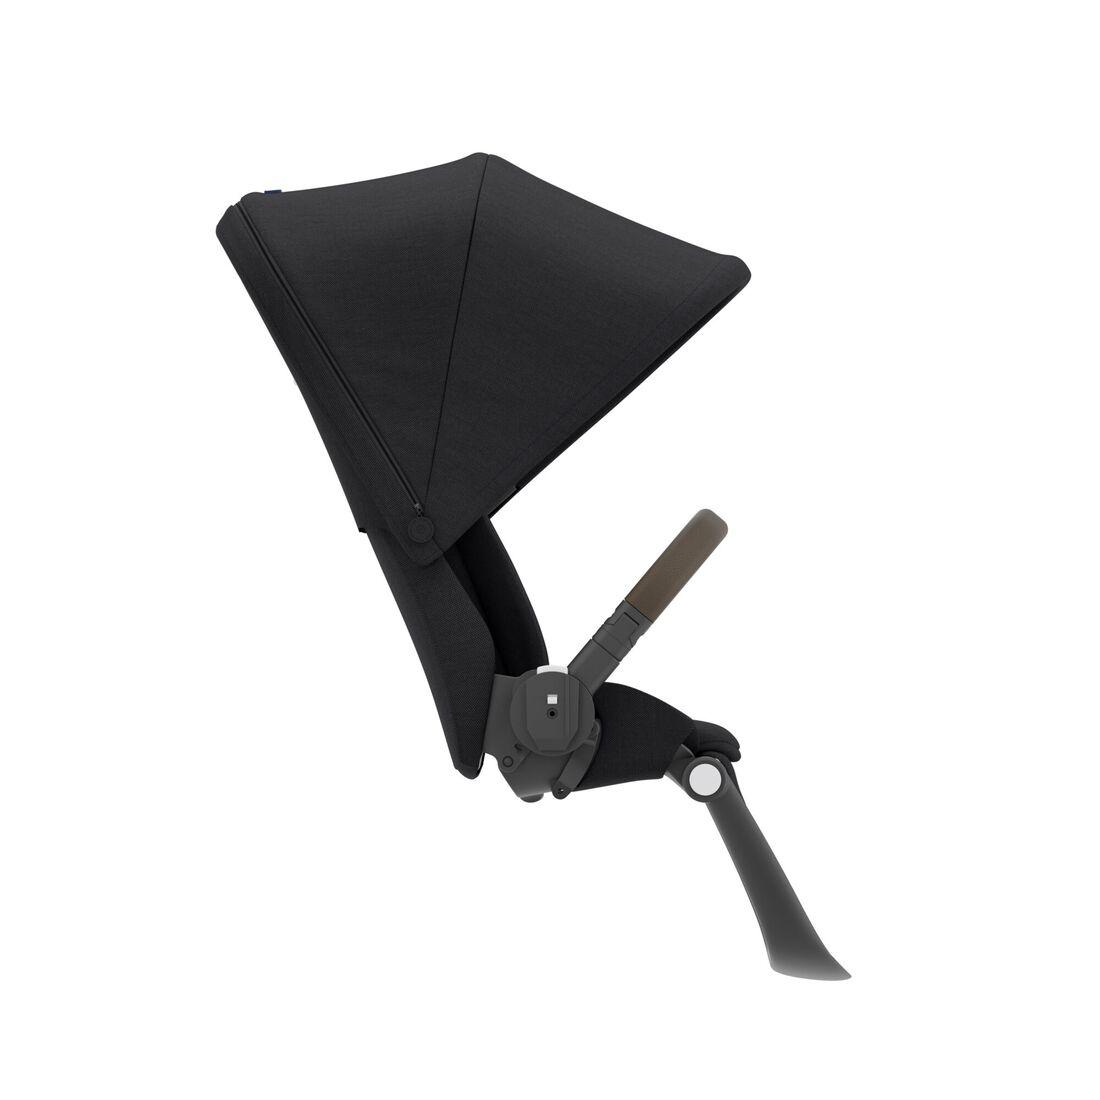 CYBEX Gazelle S Seat Unit - Deep Black (Taupe Frame) in Deep Black (Taupe Frame) large image number 2